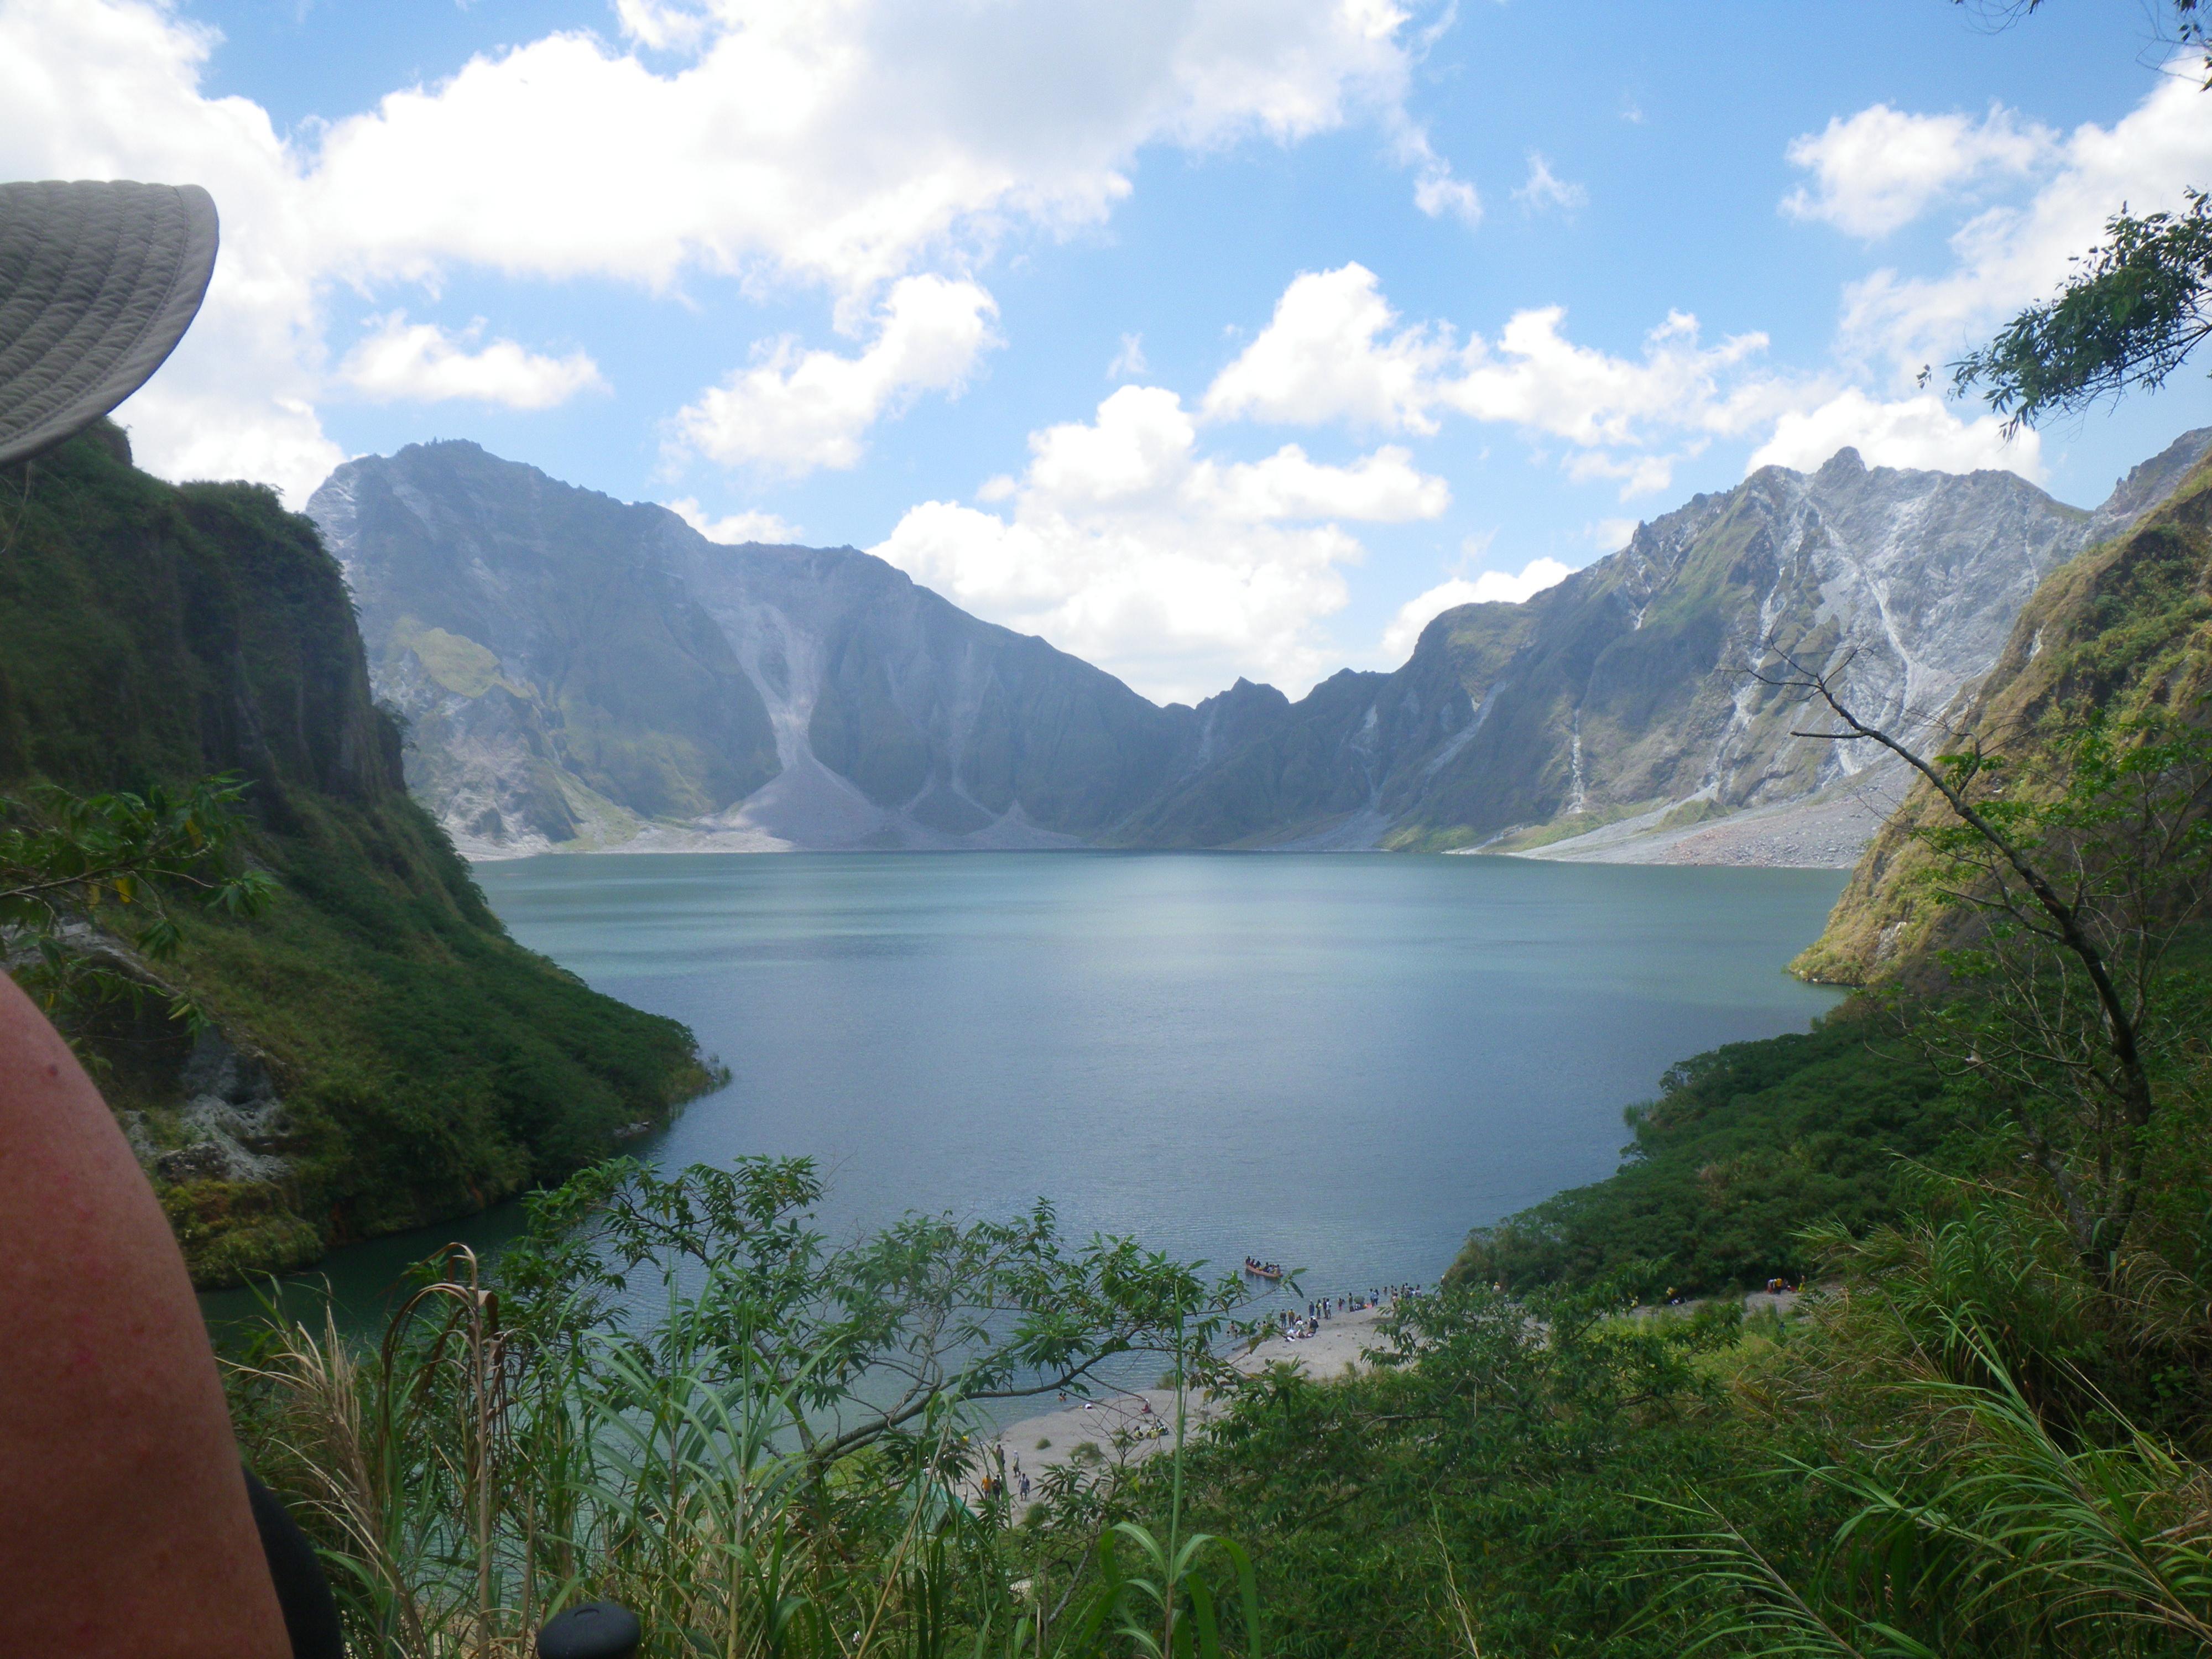 mt pinatubo essay Mt pinatubo trek is worth every step  mount pinatubo, mt pinatubo, mt pinatubo trek, mt pinatubo trek 2012, oregon, philippines, photo essay, pinoy on the road.